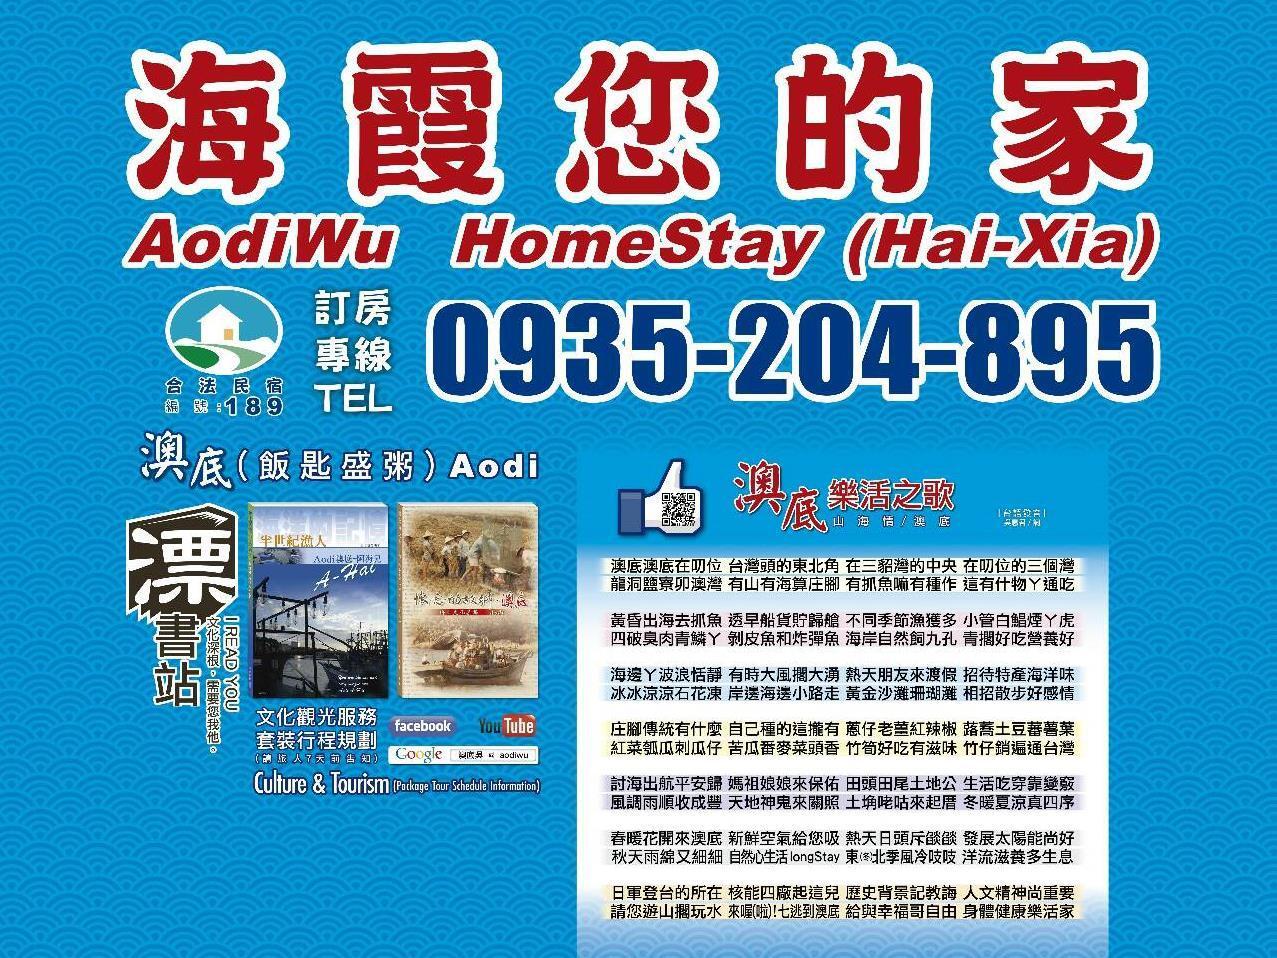 Aodiwu Homestay  Hai Xia